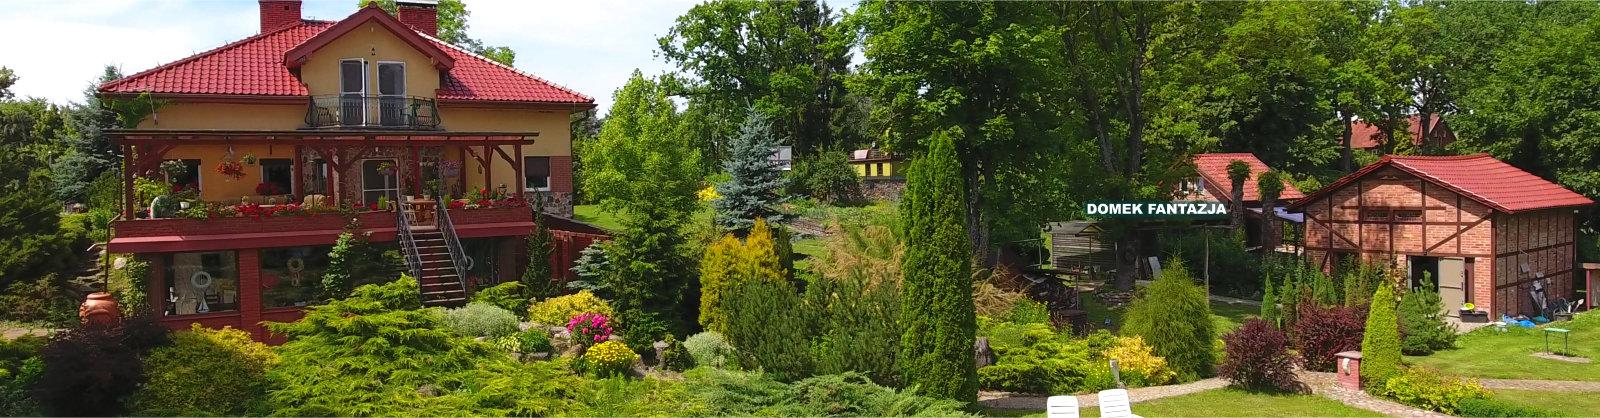 Villa Przystań, domek Fantazja